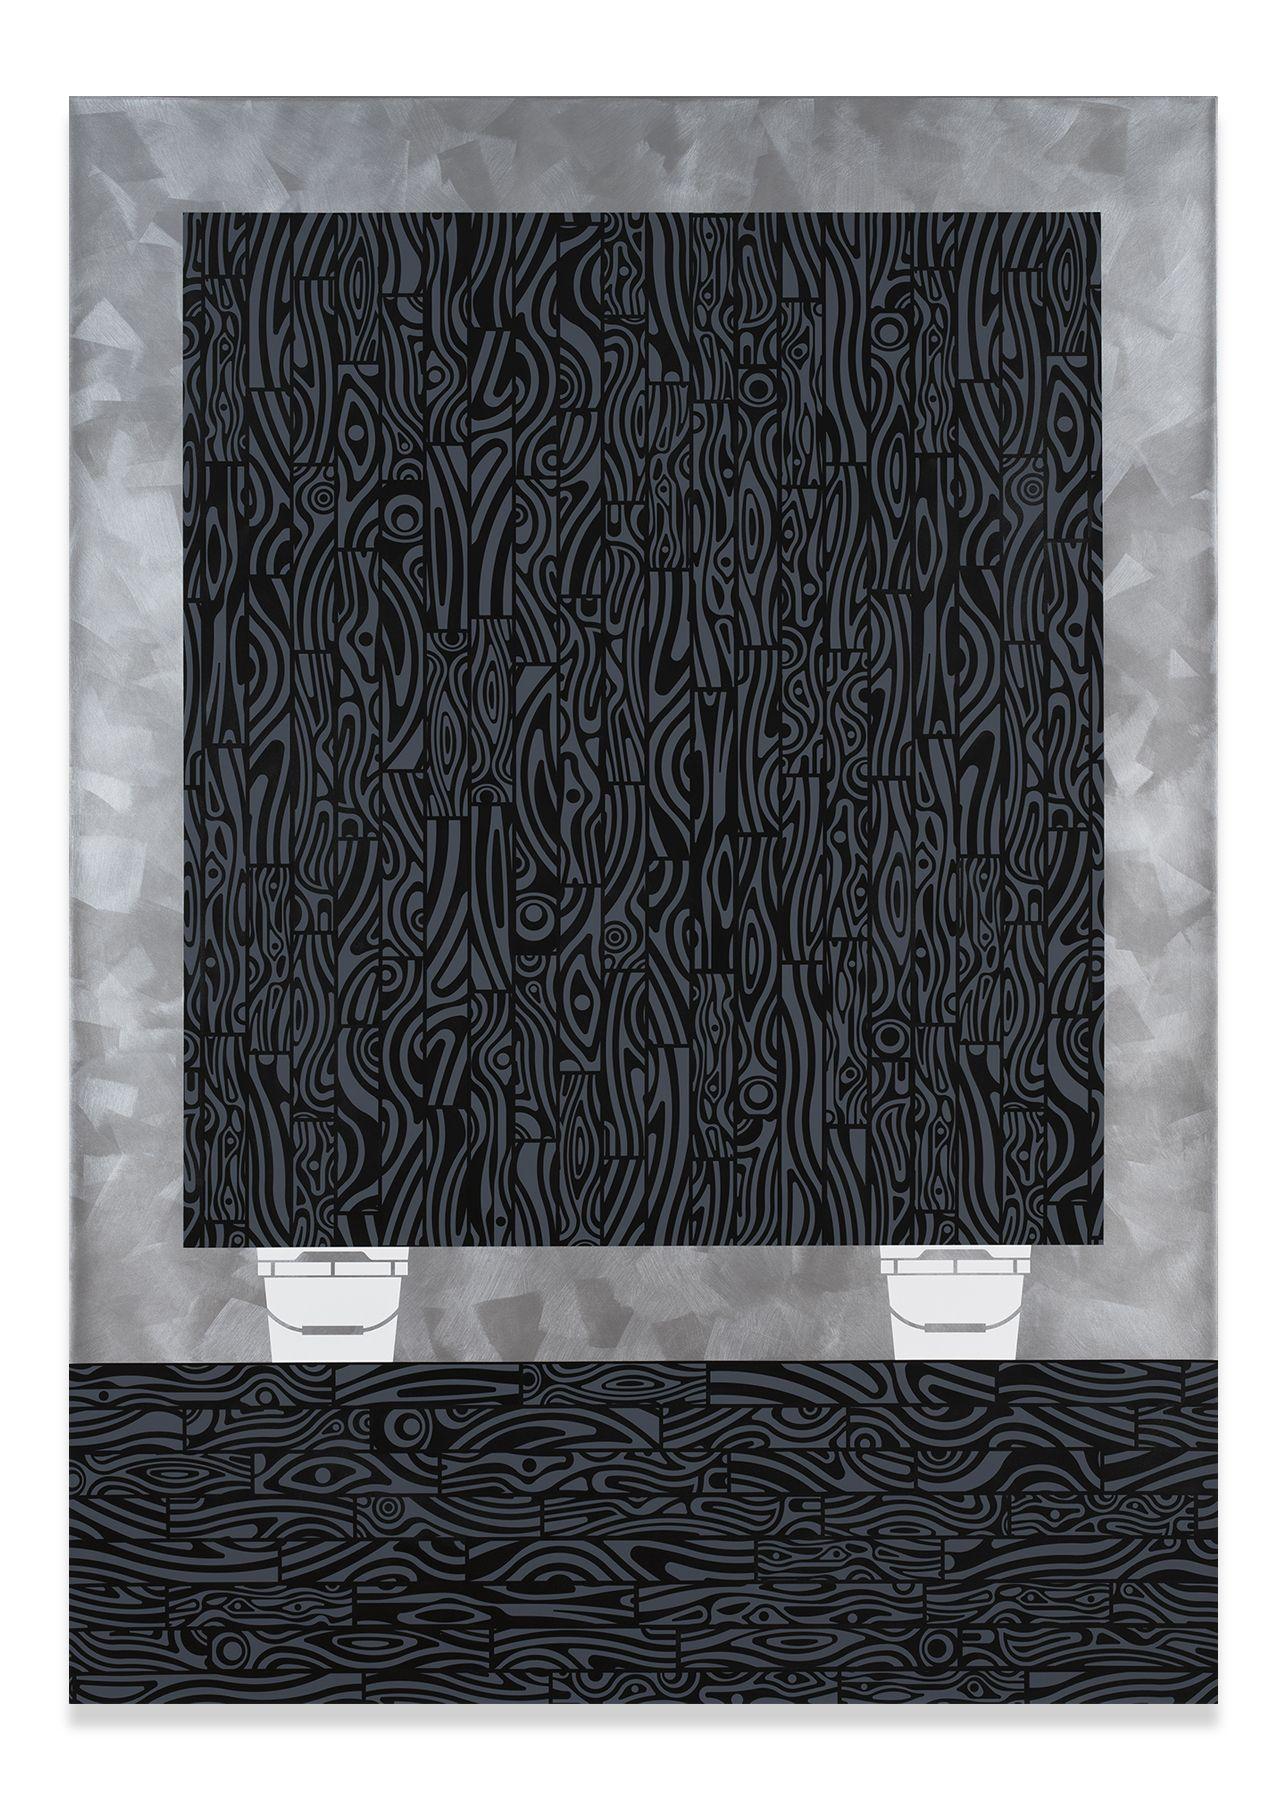 Studio Floor (Grey), 2017,Acrylic on linen,84 x 60 inches,213.4 x 152.4 cm,MMG#31349